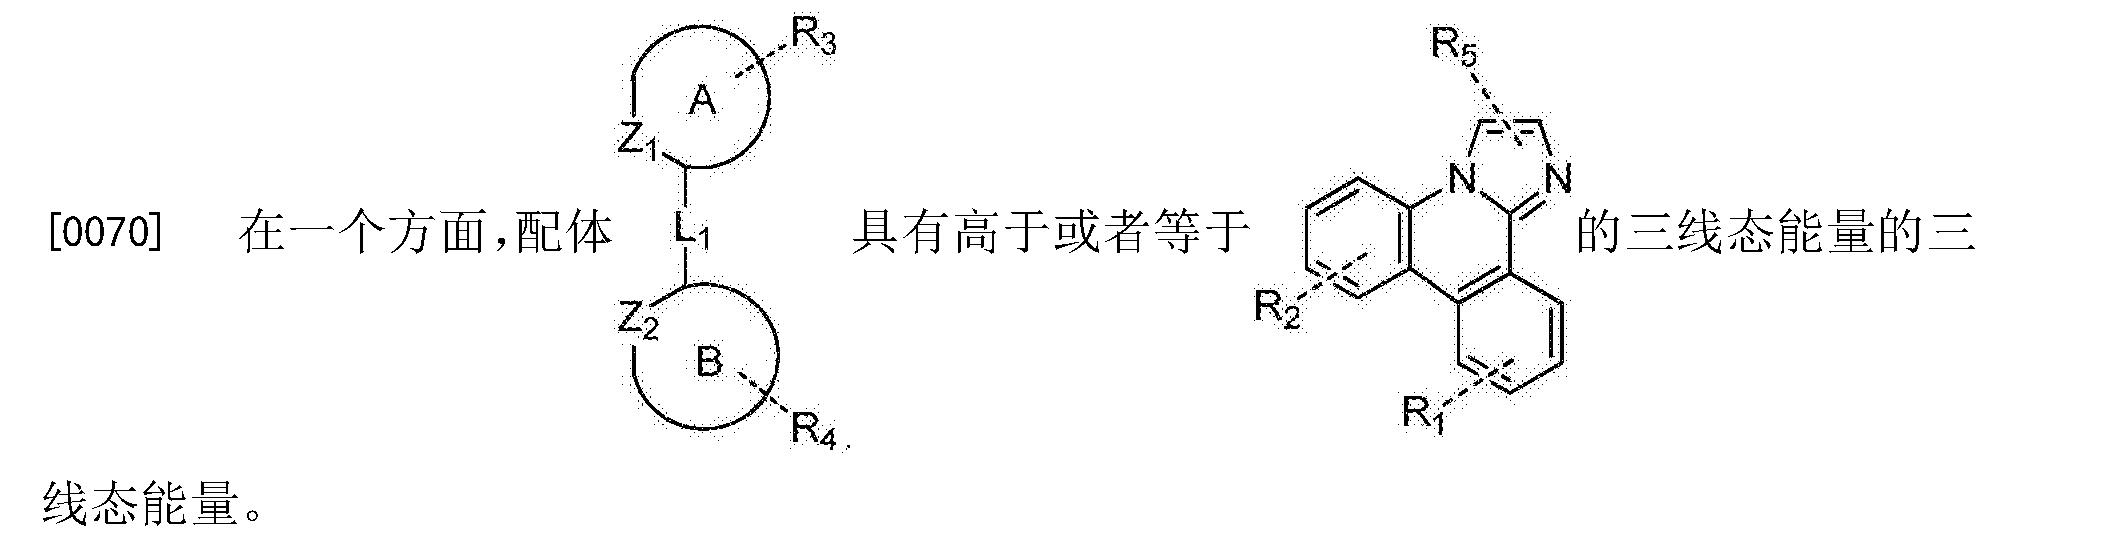 Figure CN106749425AD00443